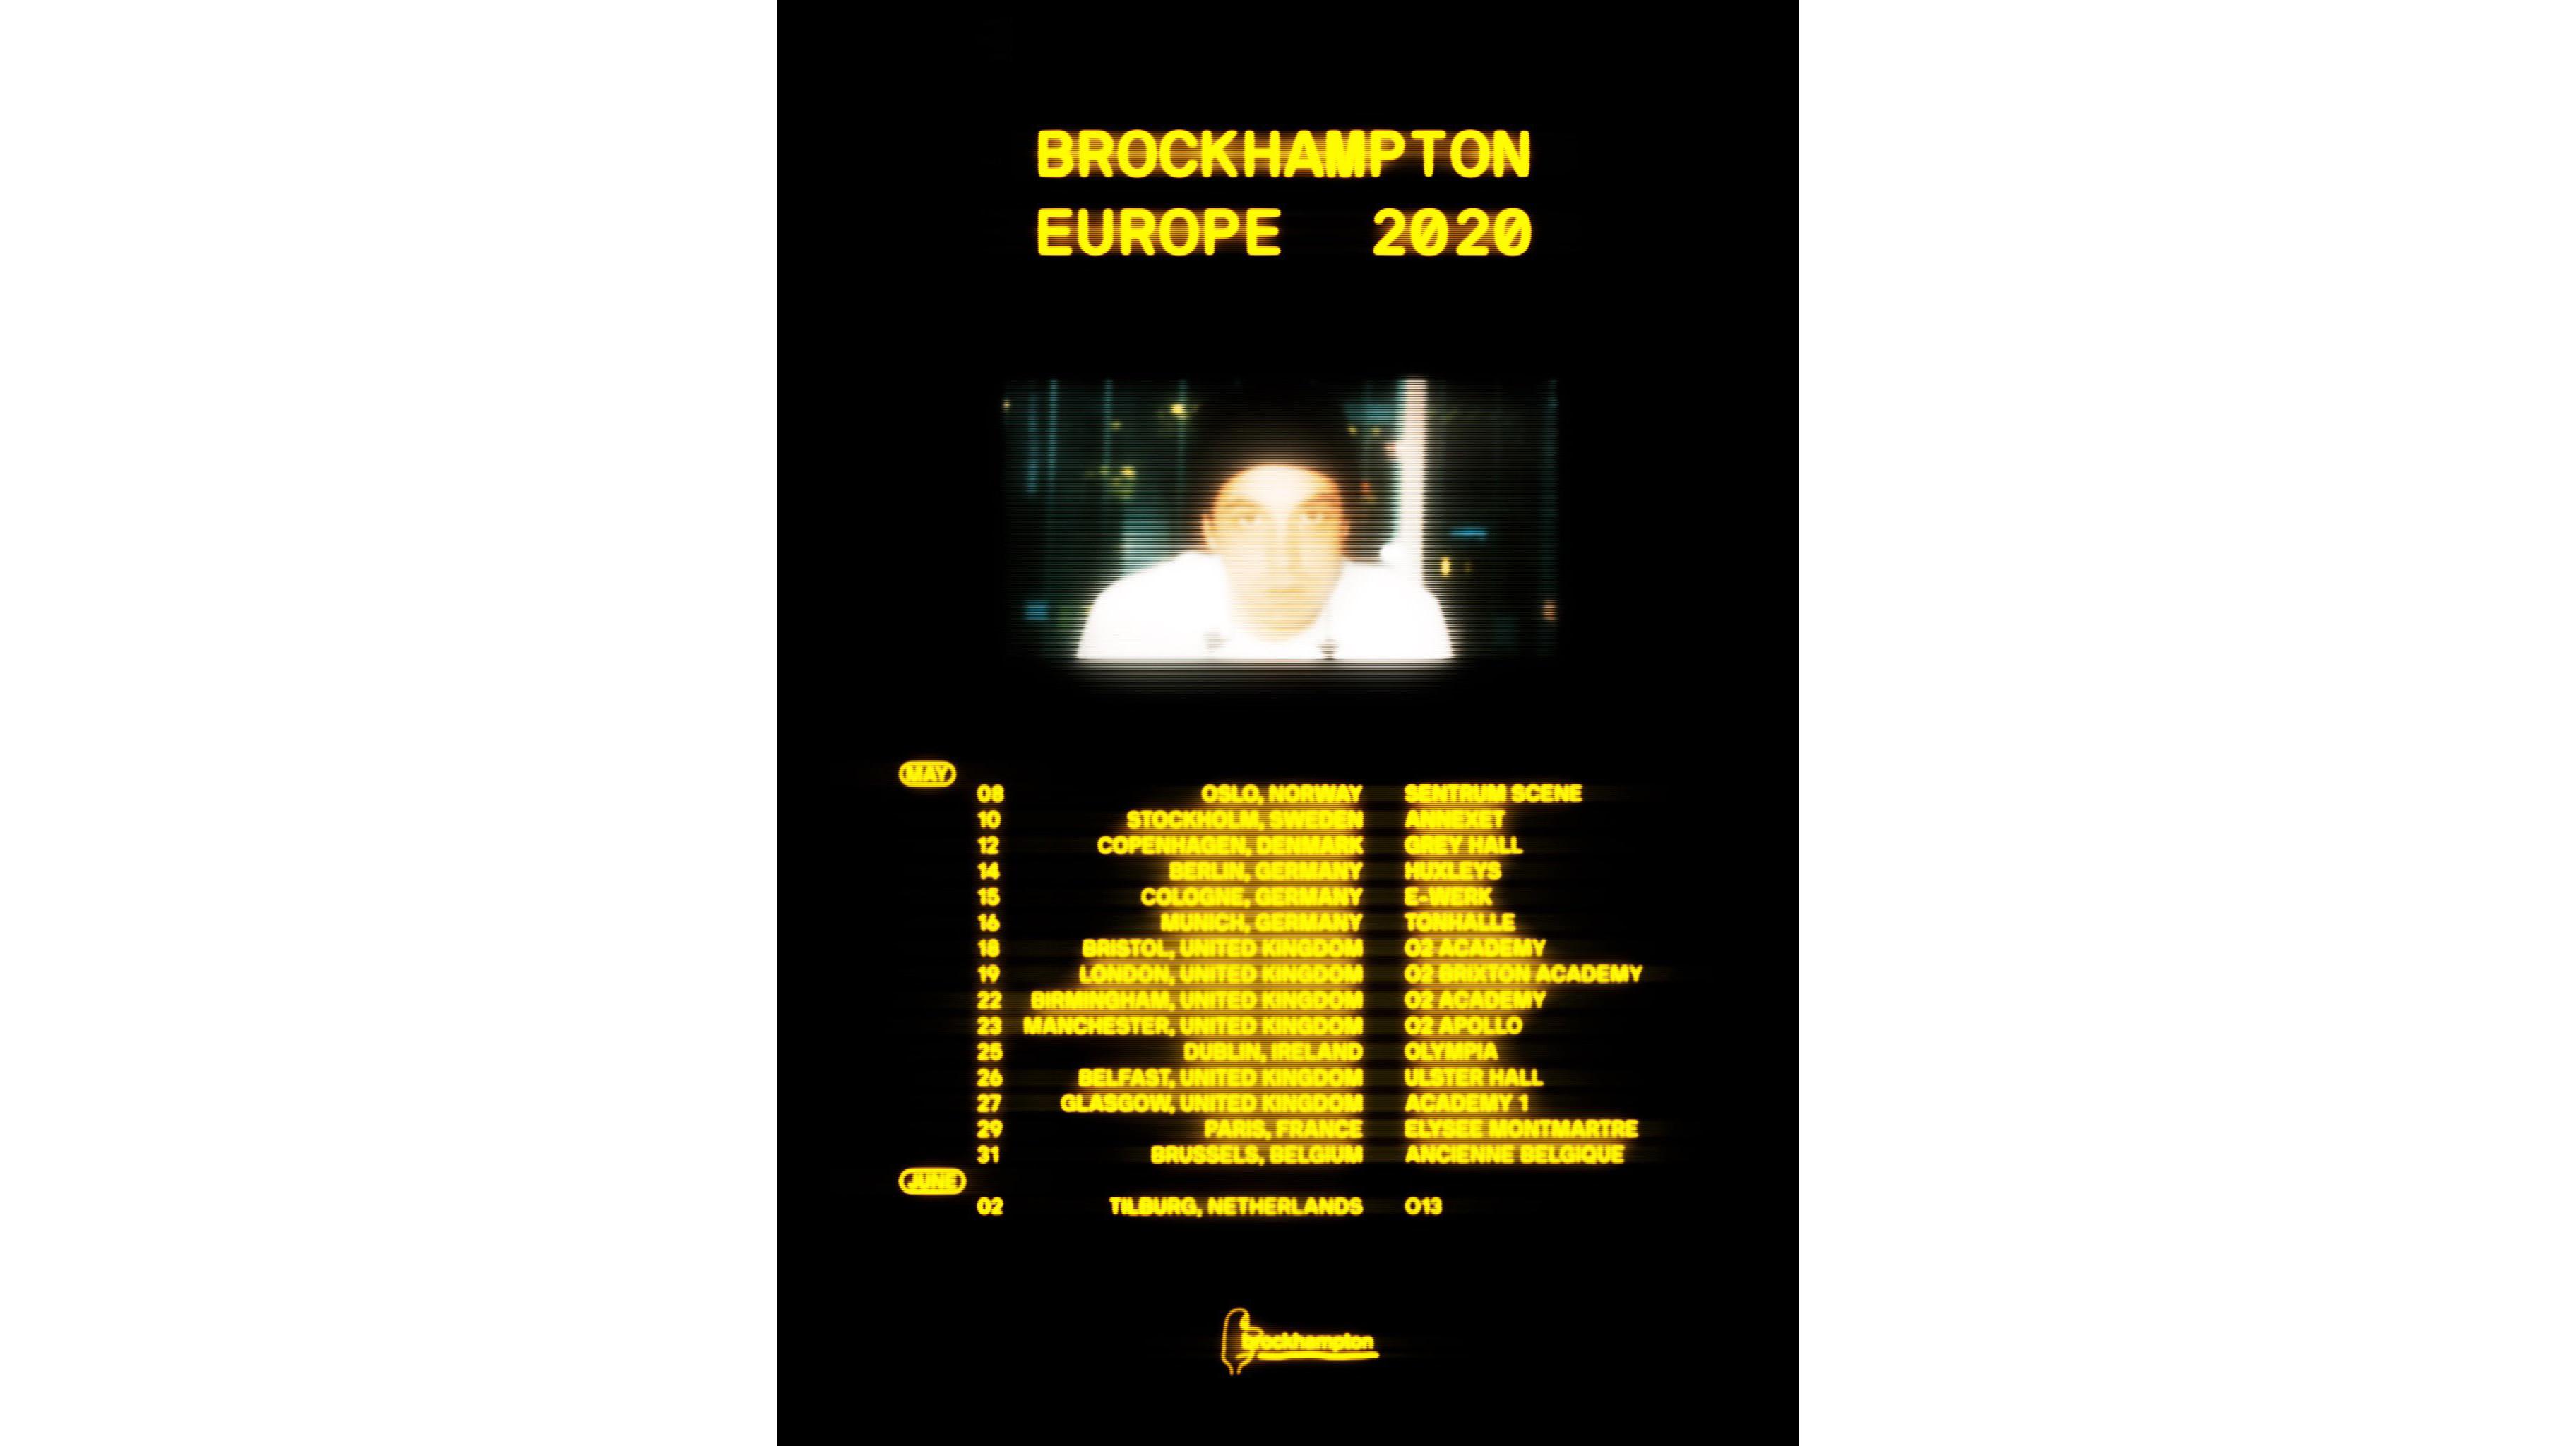 BROCKHAMPTON 将开启新一轮欧洲巡演